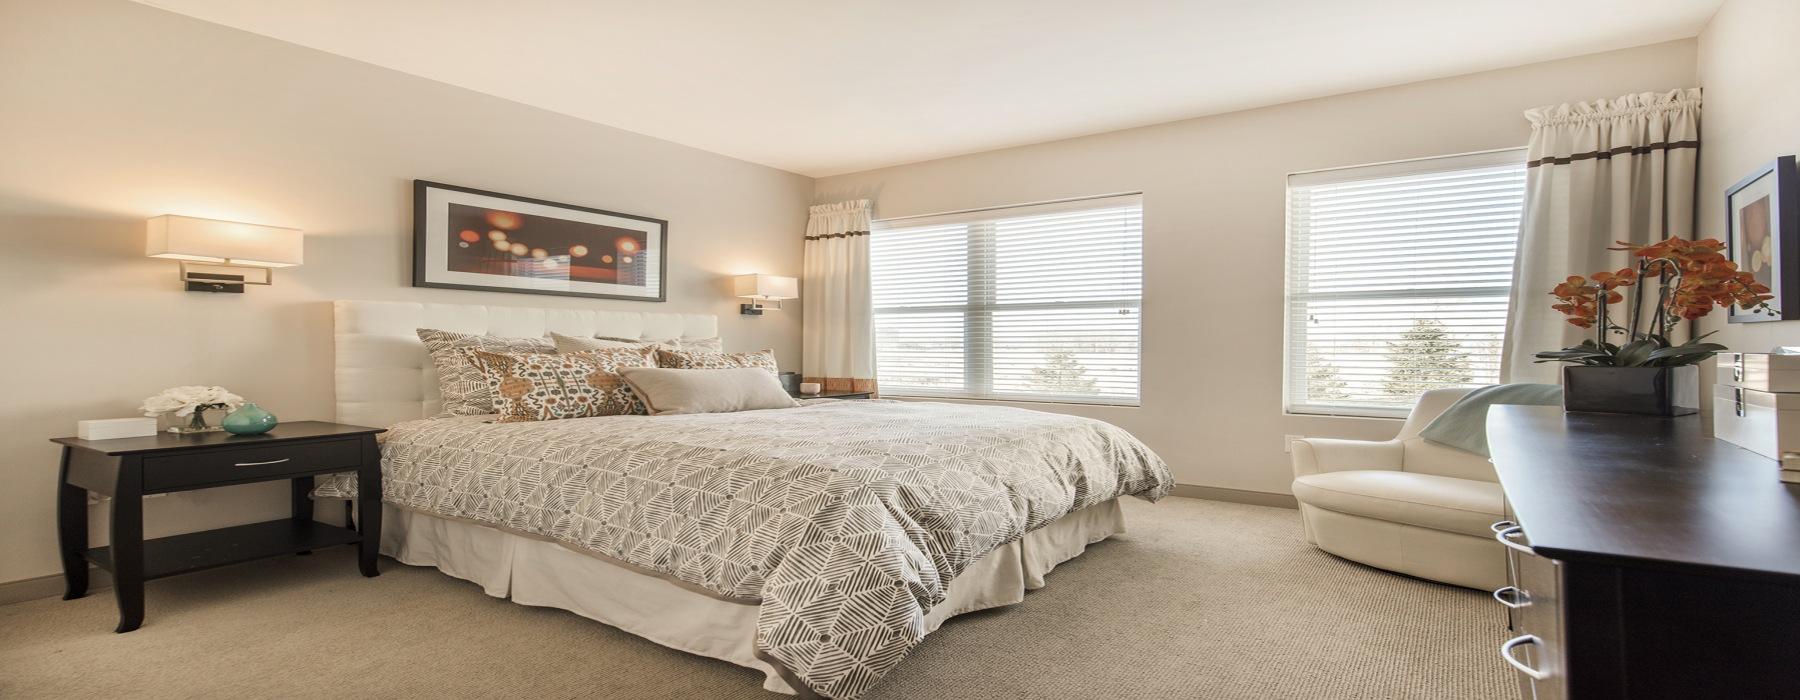 MarketStreet Bedroom